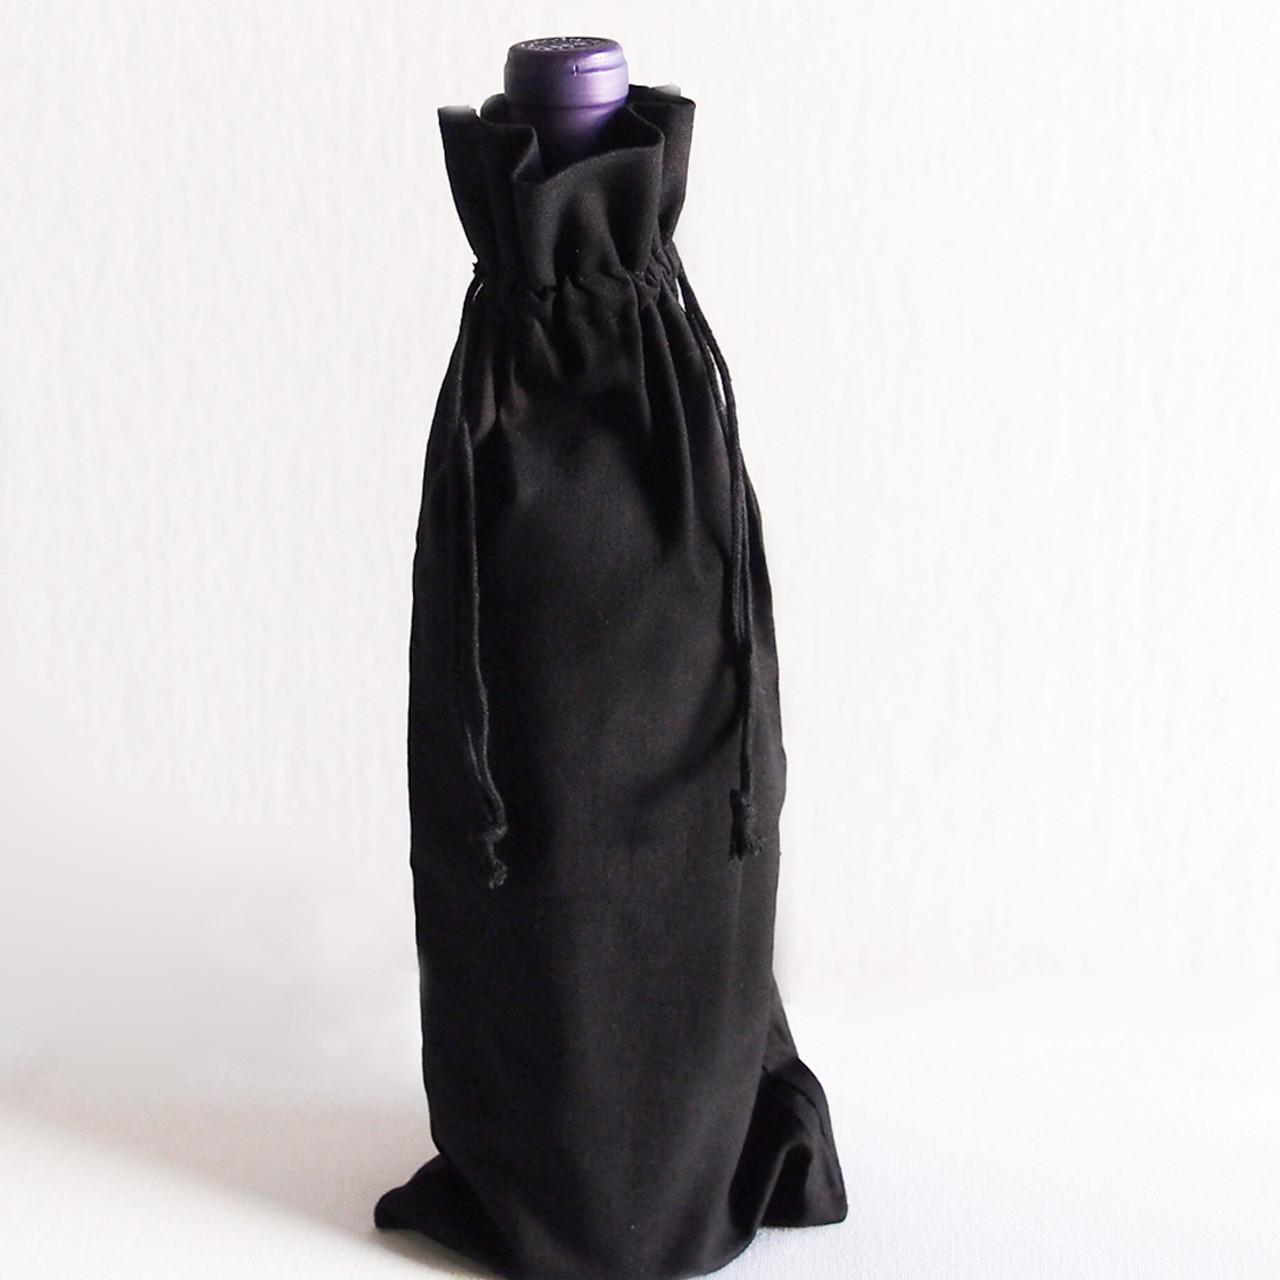 Black Cotton Drawstring Bags 8 x 10 inches, Wholesale Black Drawstring Bags | Packaging Decor